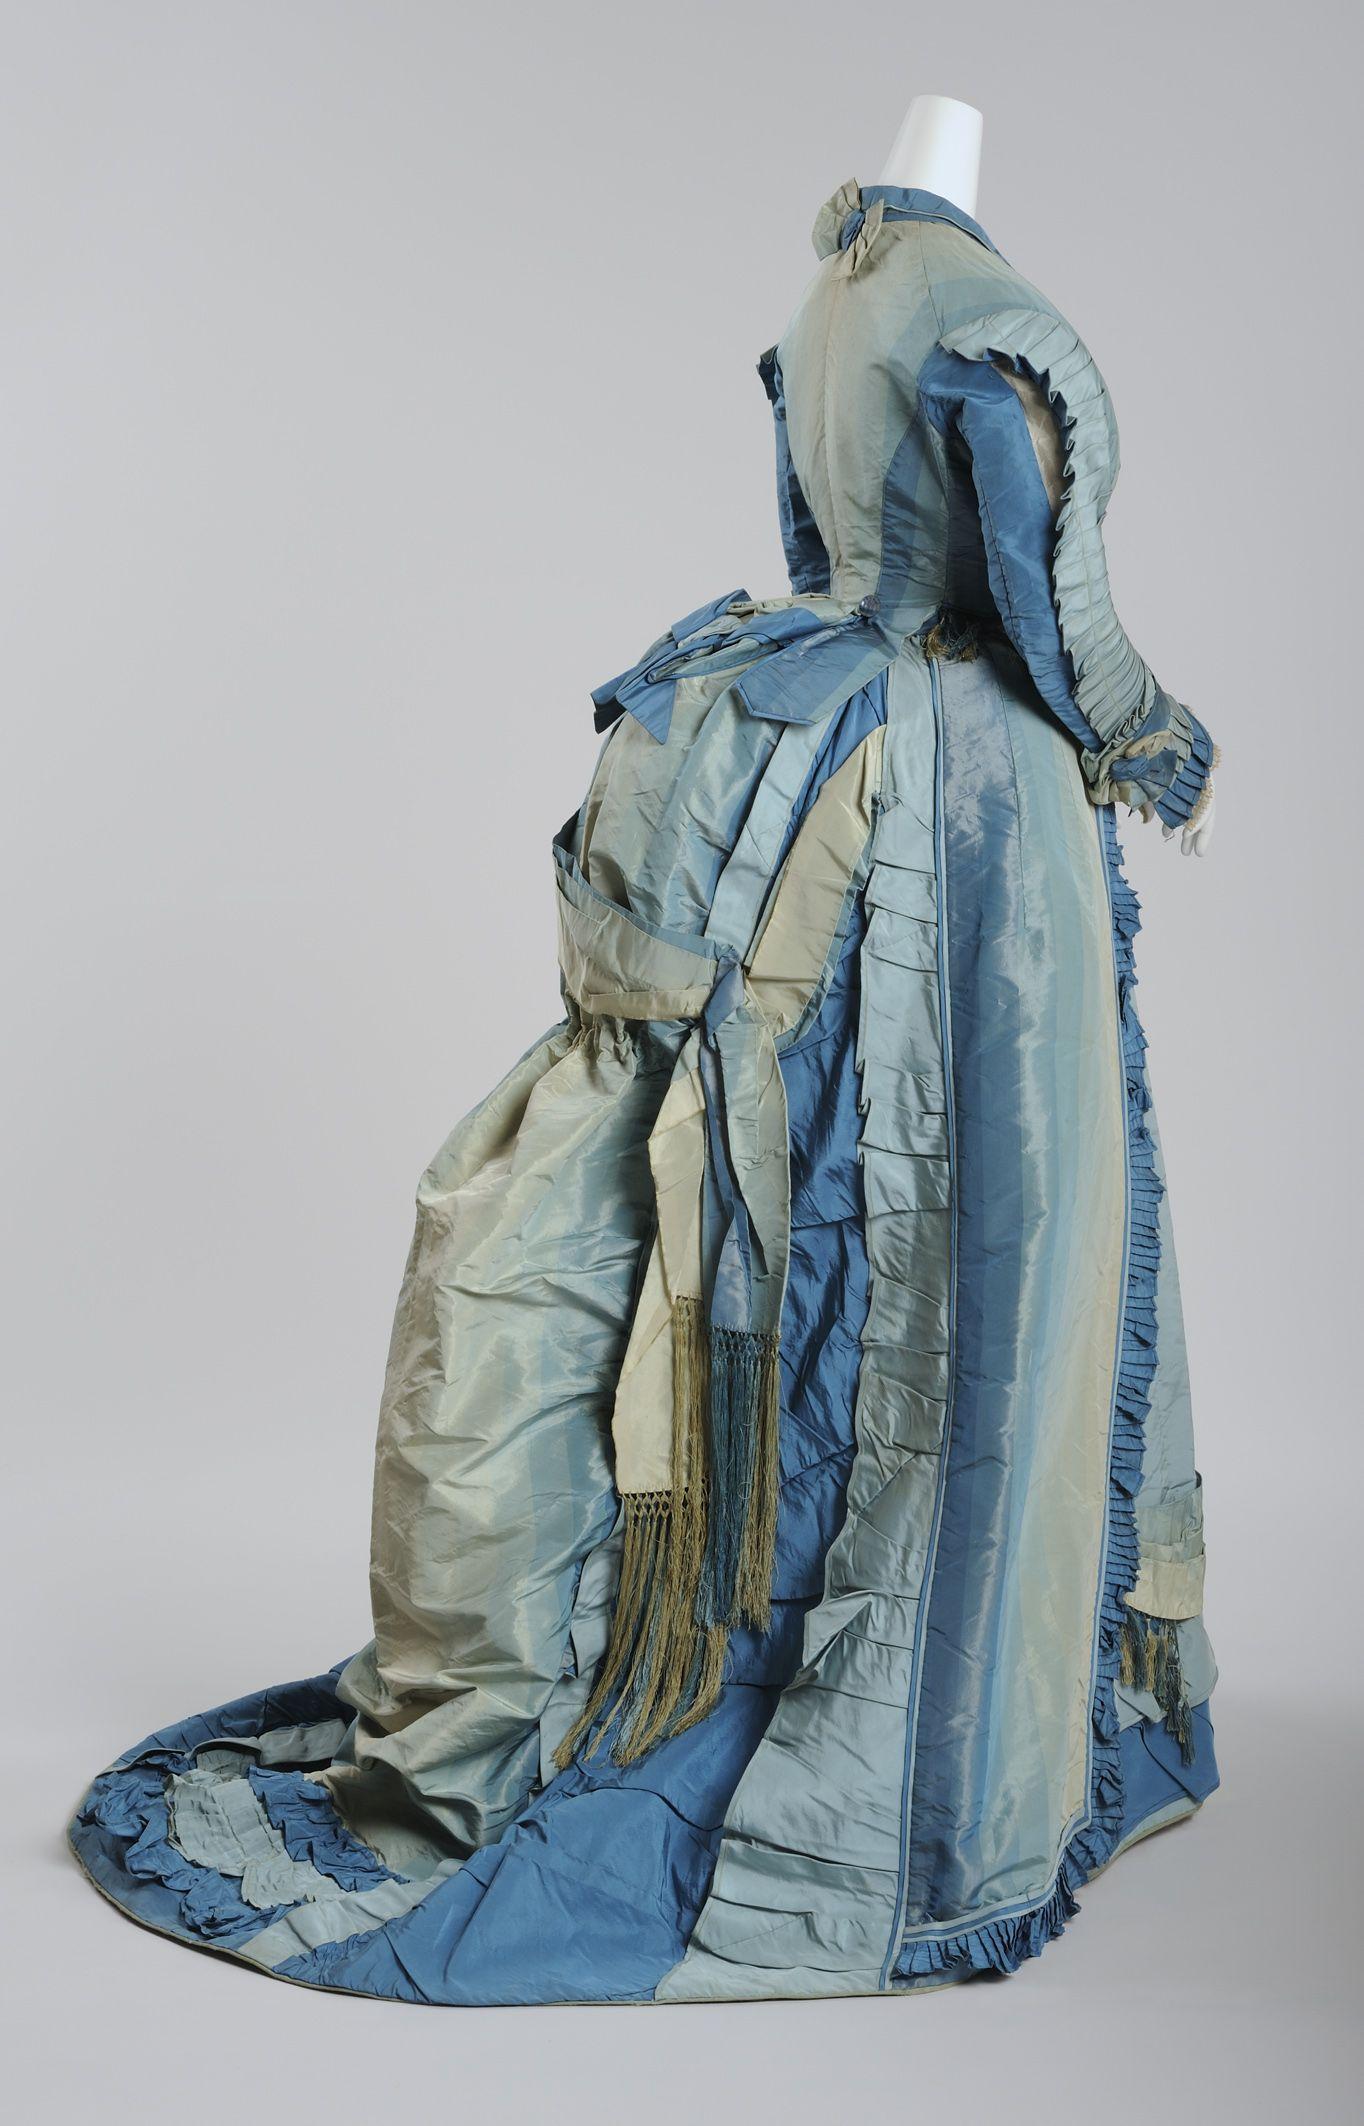 museumsquartier wien | viktorianischer stil, vintage outfits